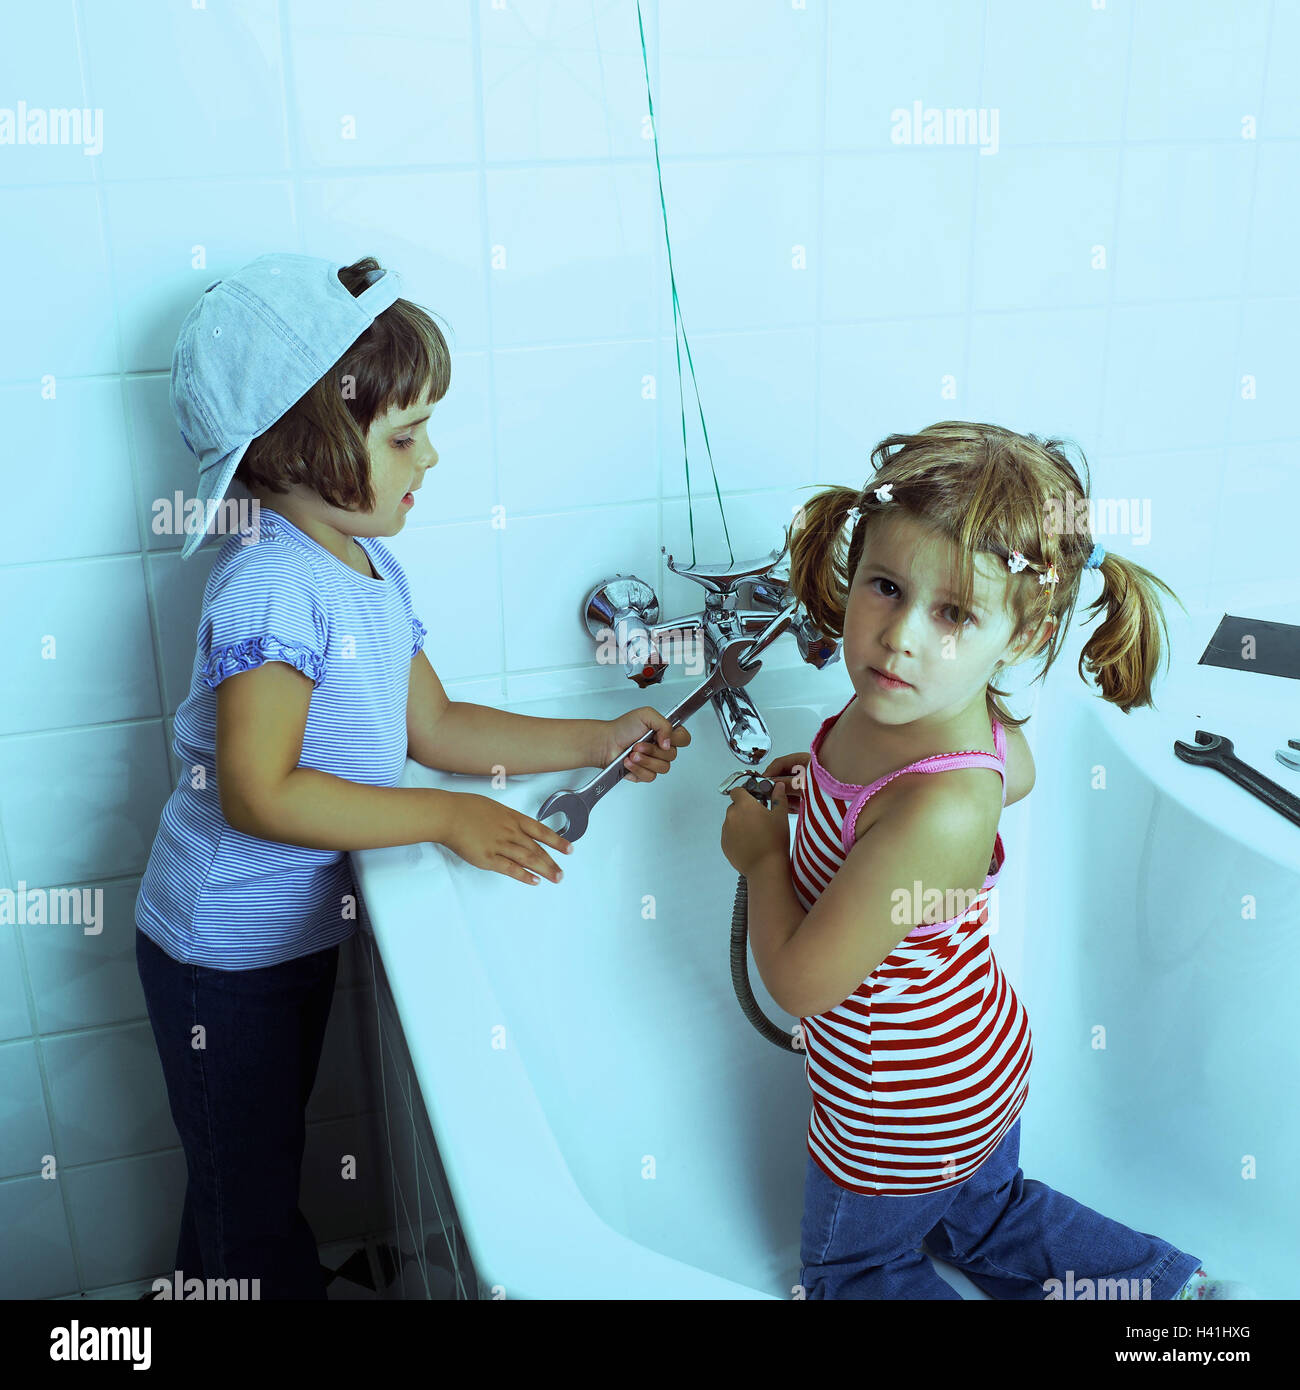 Bathrooms, children, bath, armatures, spanners, play bath, tub, girl ...